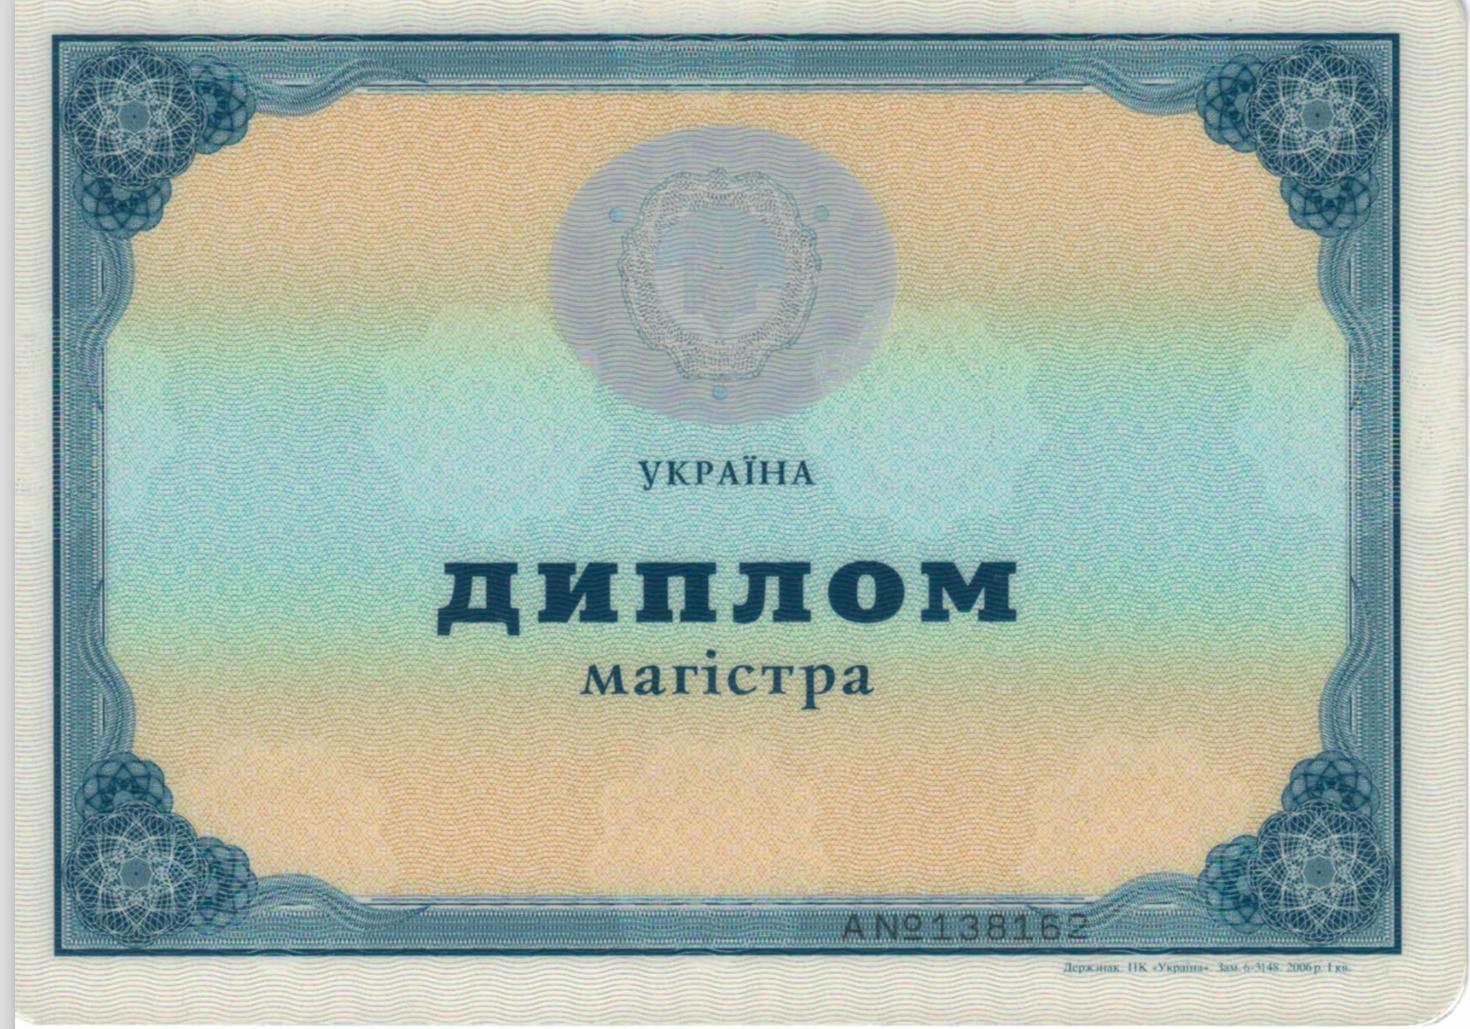 https://astrologtasha.ru/wp-content/uploads/2020/10/diplom1-1.jpg